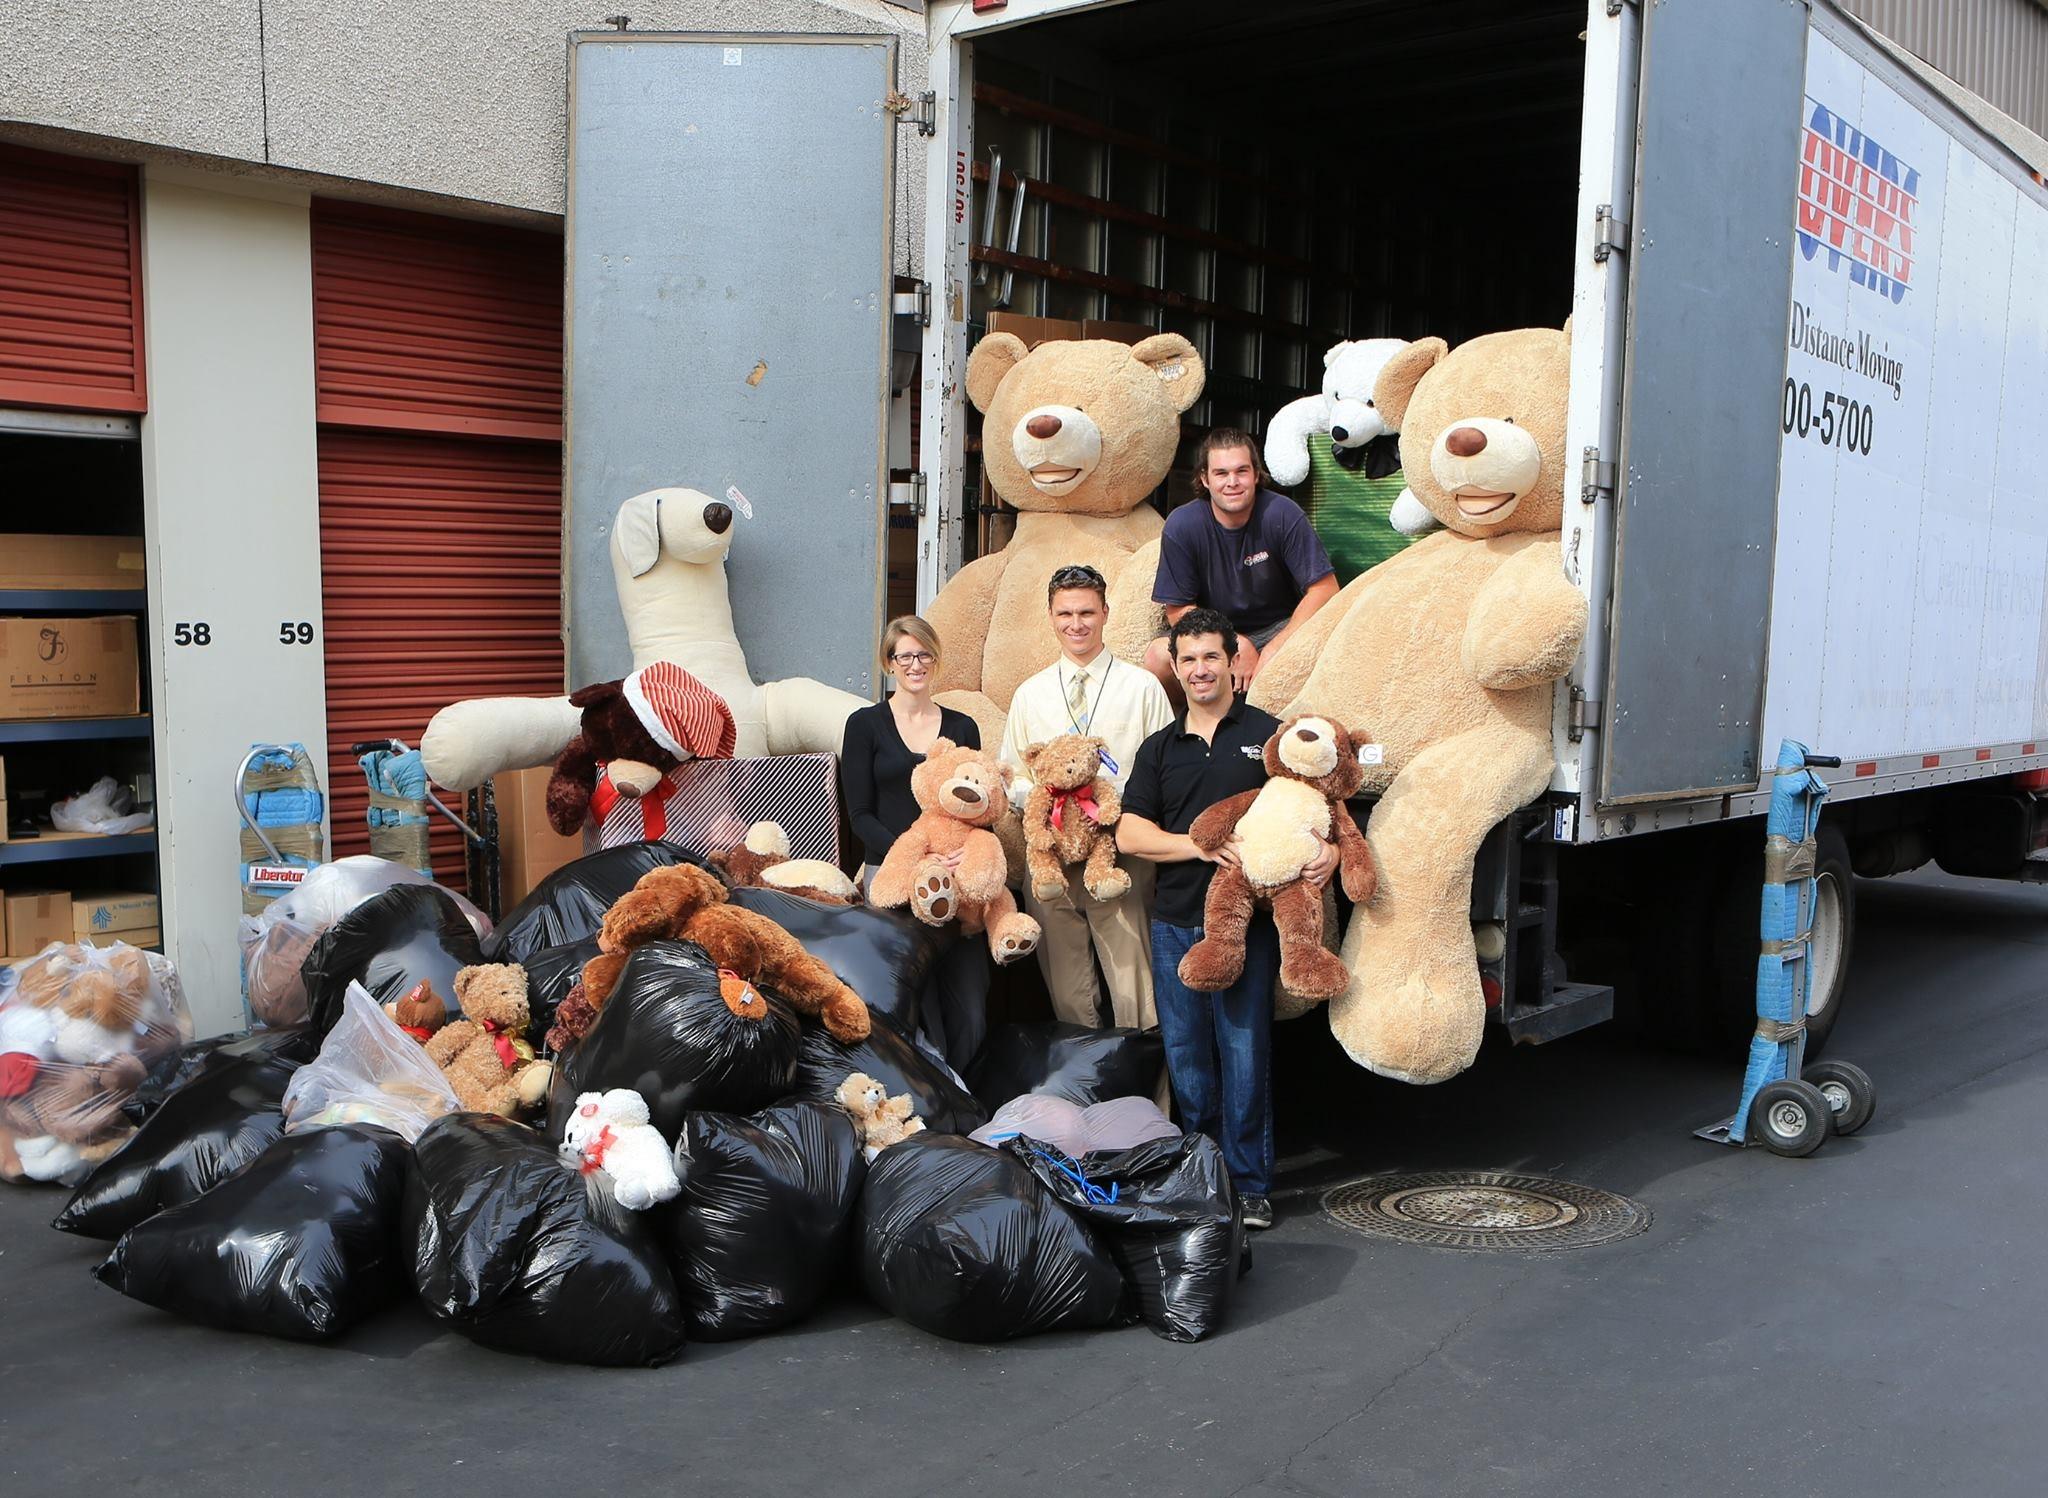 stuff-animals-teddy-bears